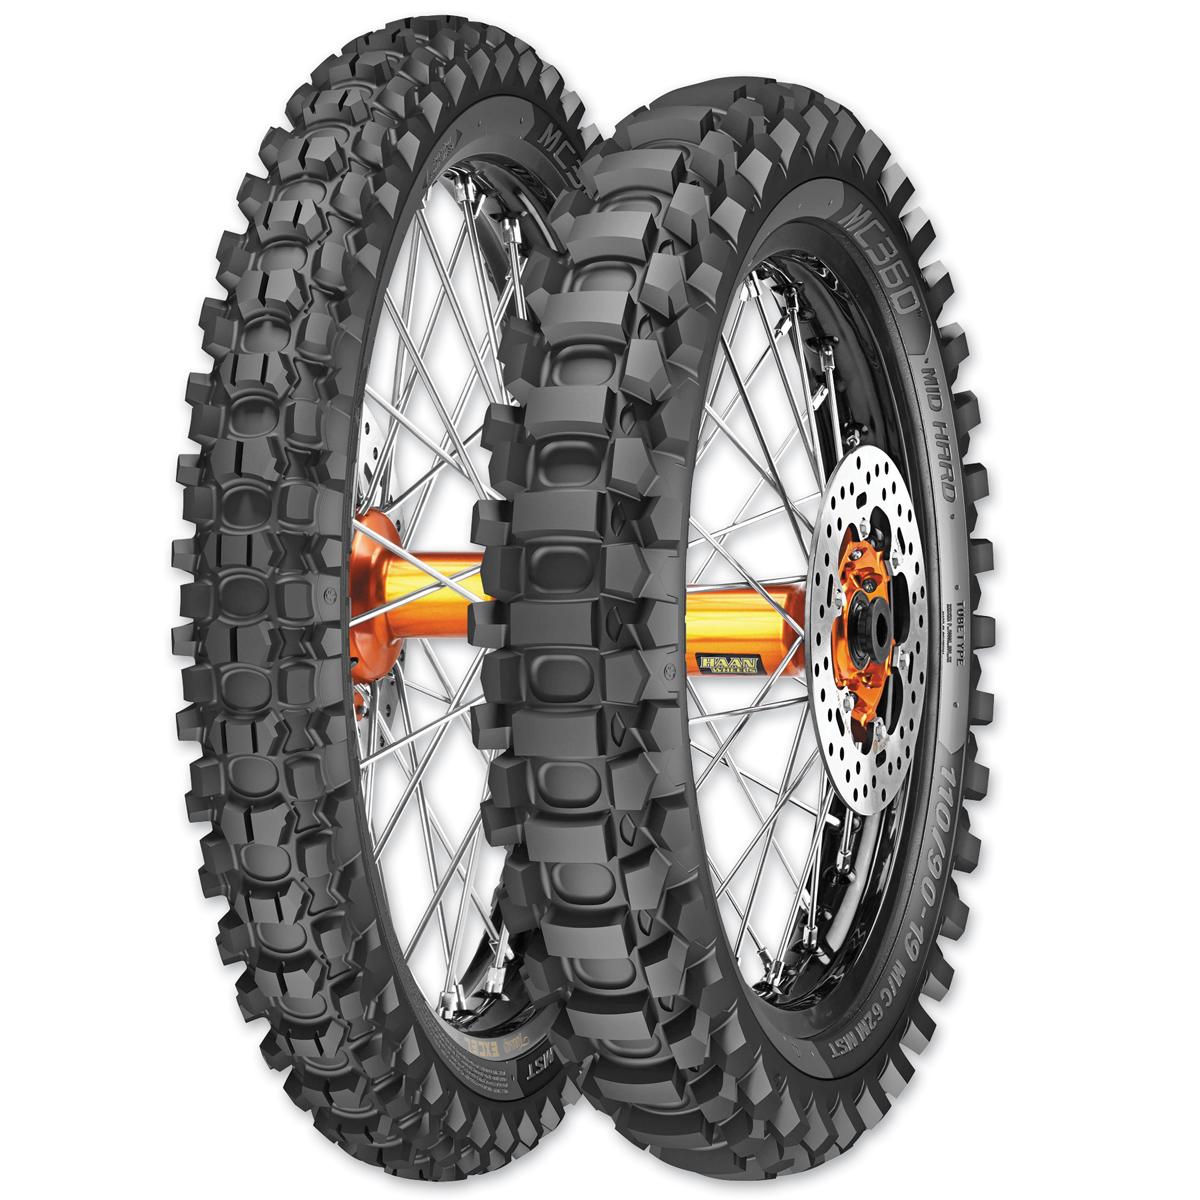 Metzeler MC 360 110/90-19 Rear Tire